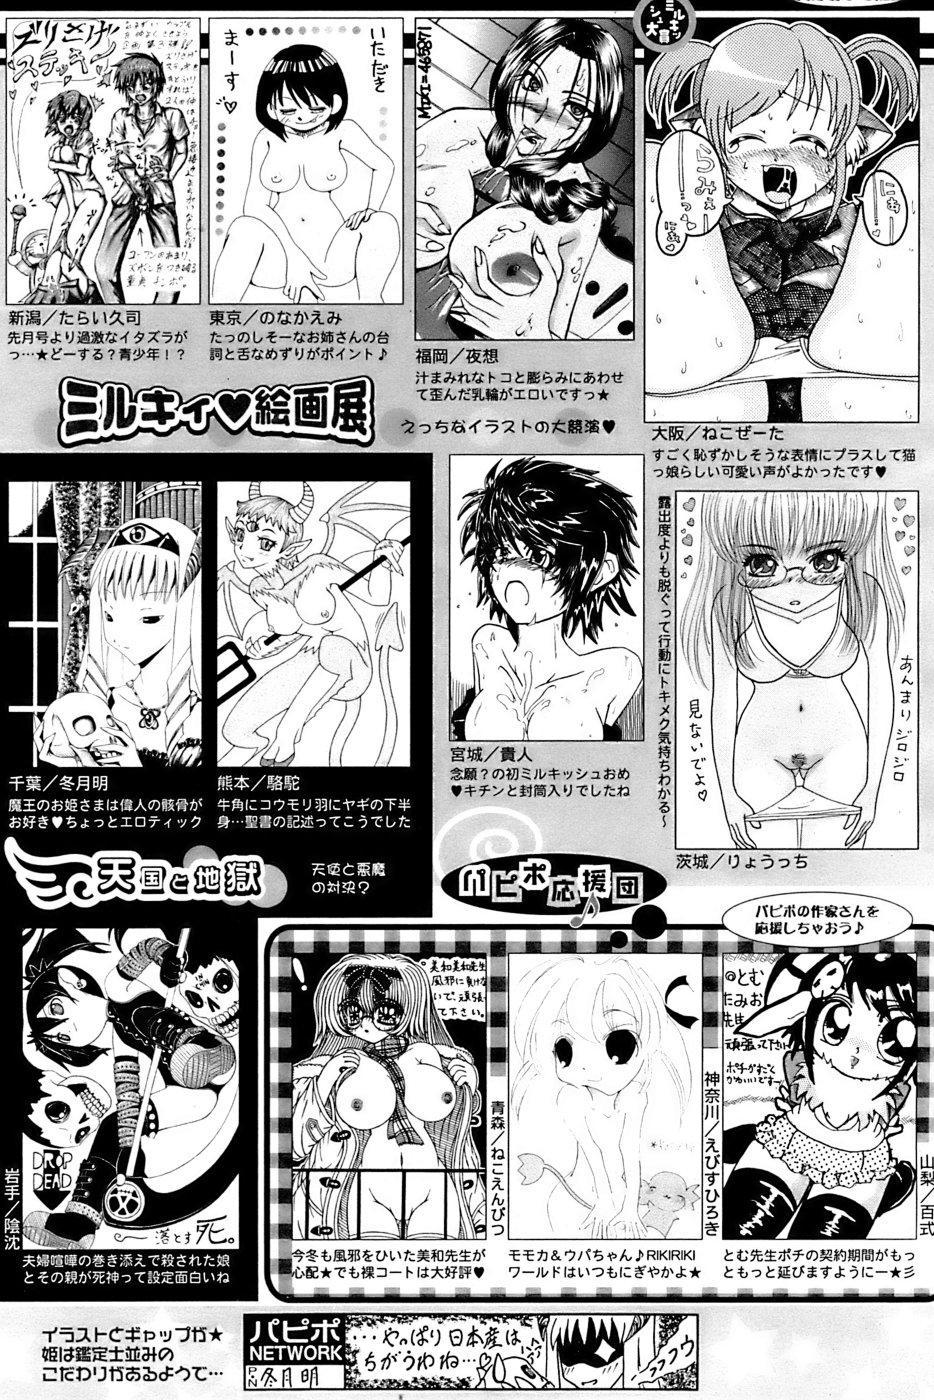 Comic Papipo 2007-04 253